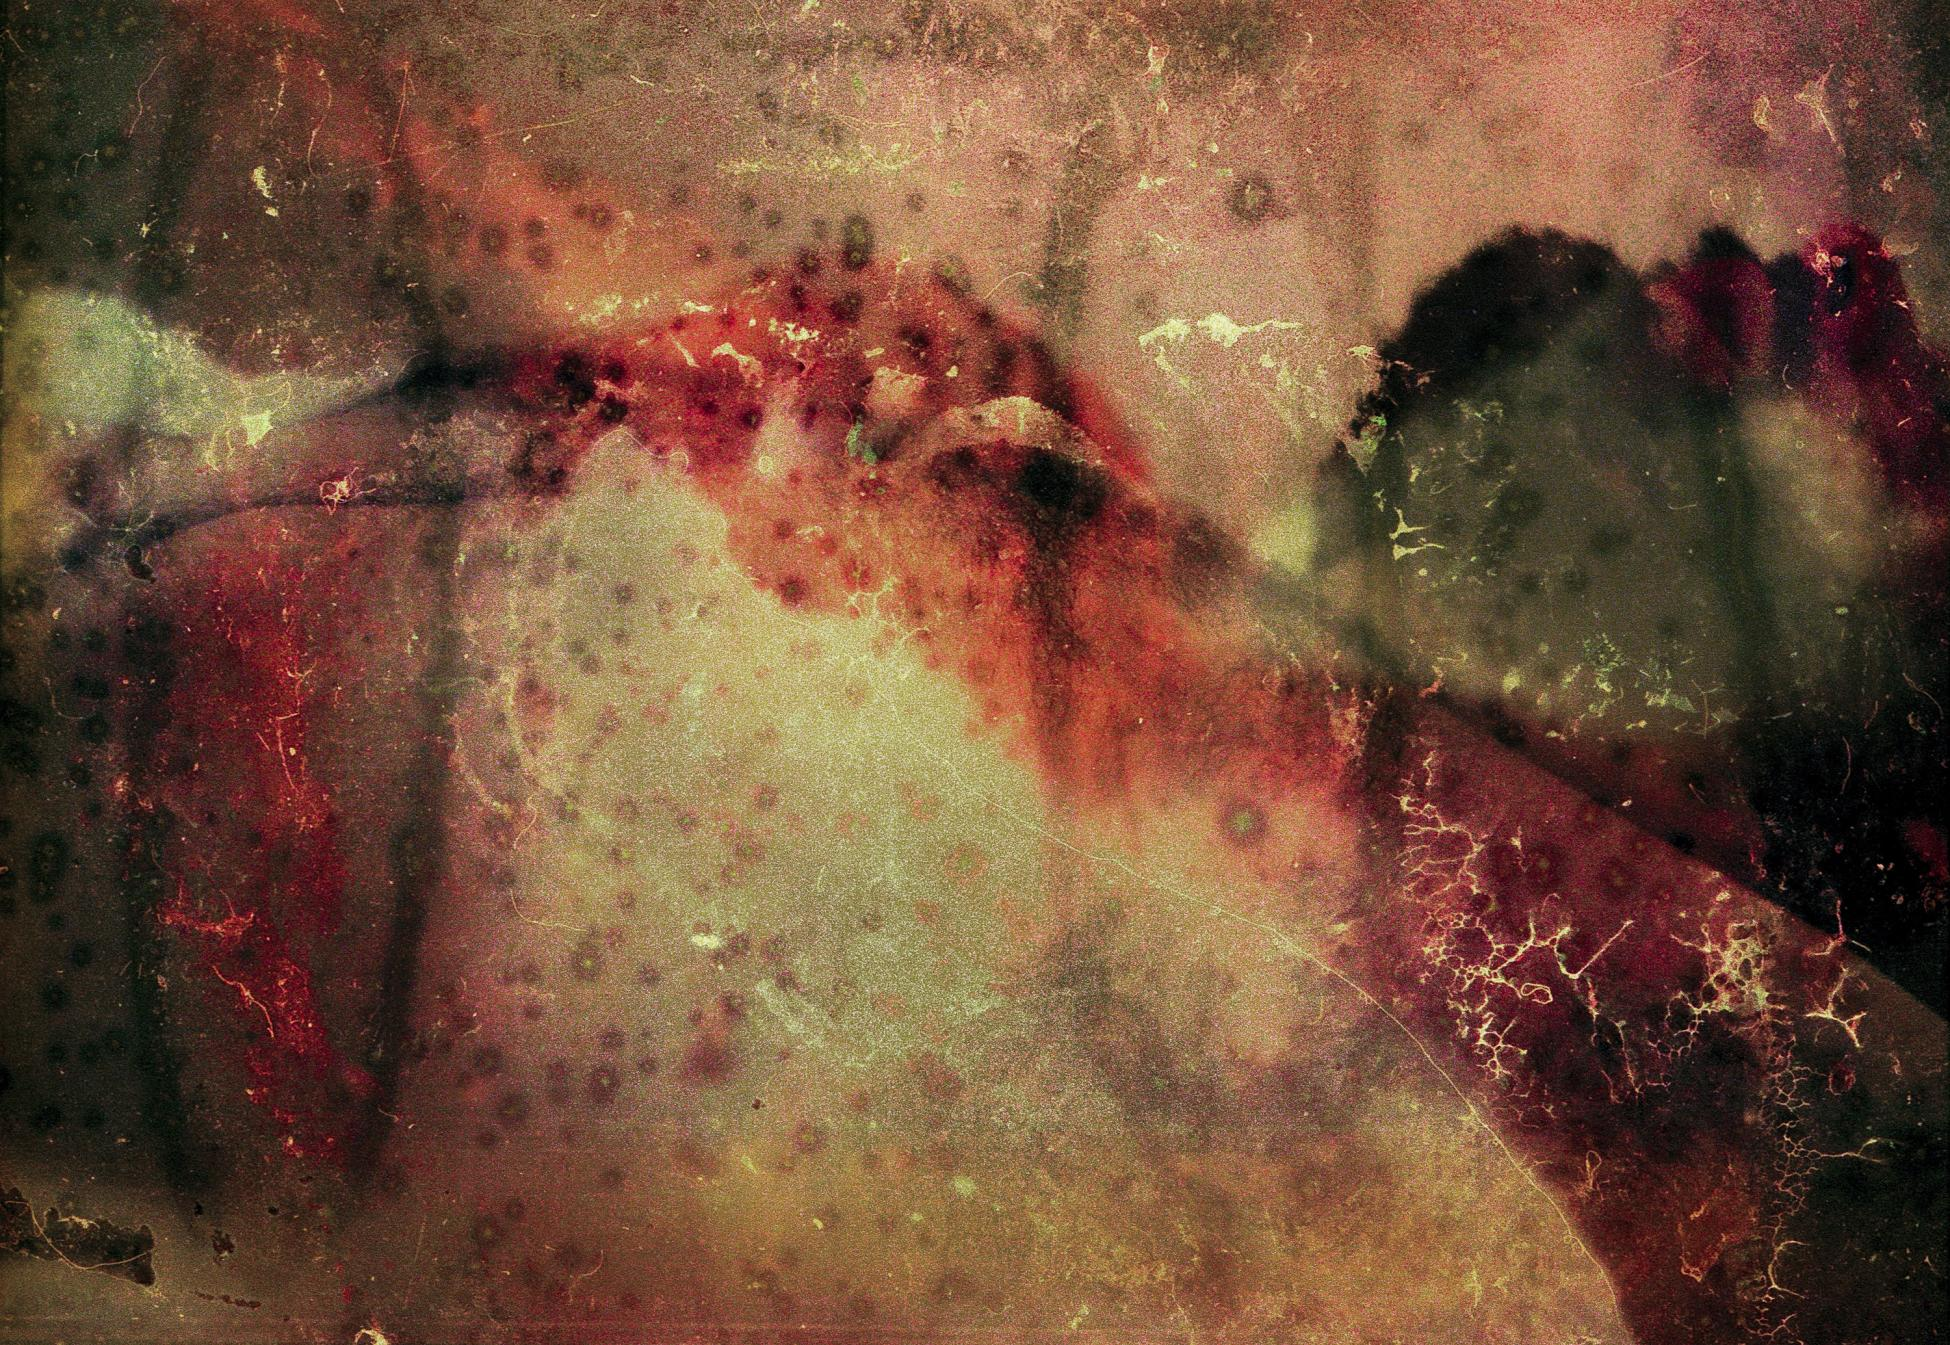 El yo degradado (2018) - Guido Salas Pimentel - Mr. Schwarz